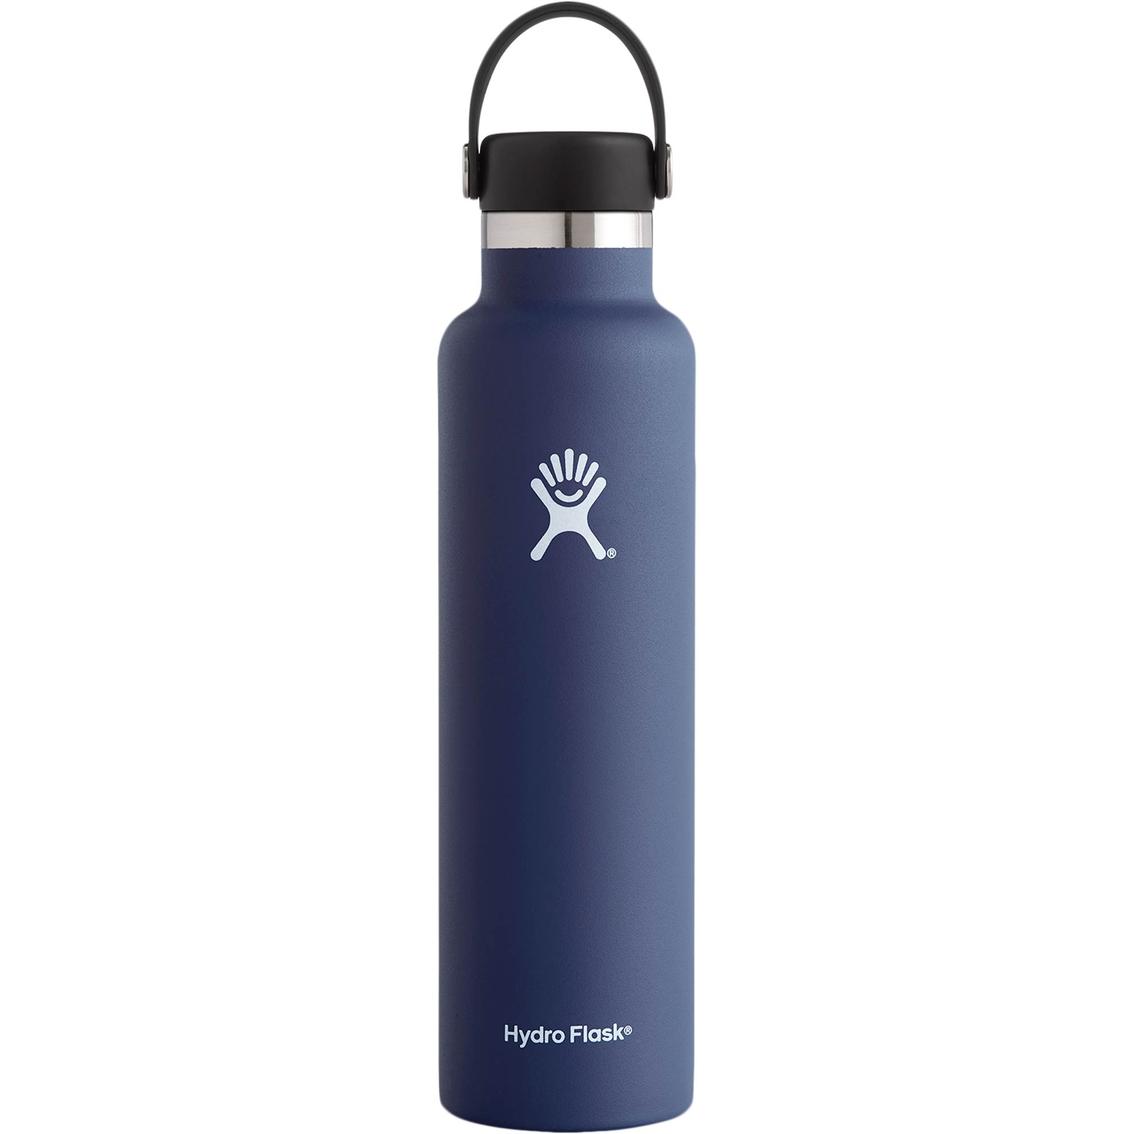 Hydro Flask 24 Oz Standard Mouth Flex Cap Insulated